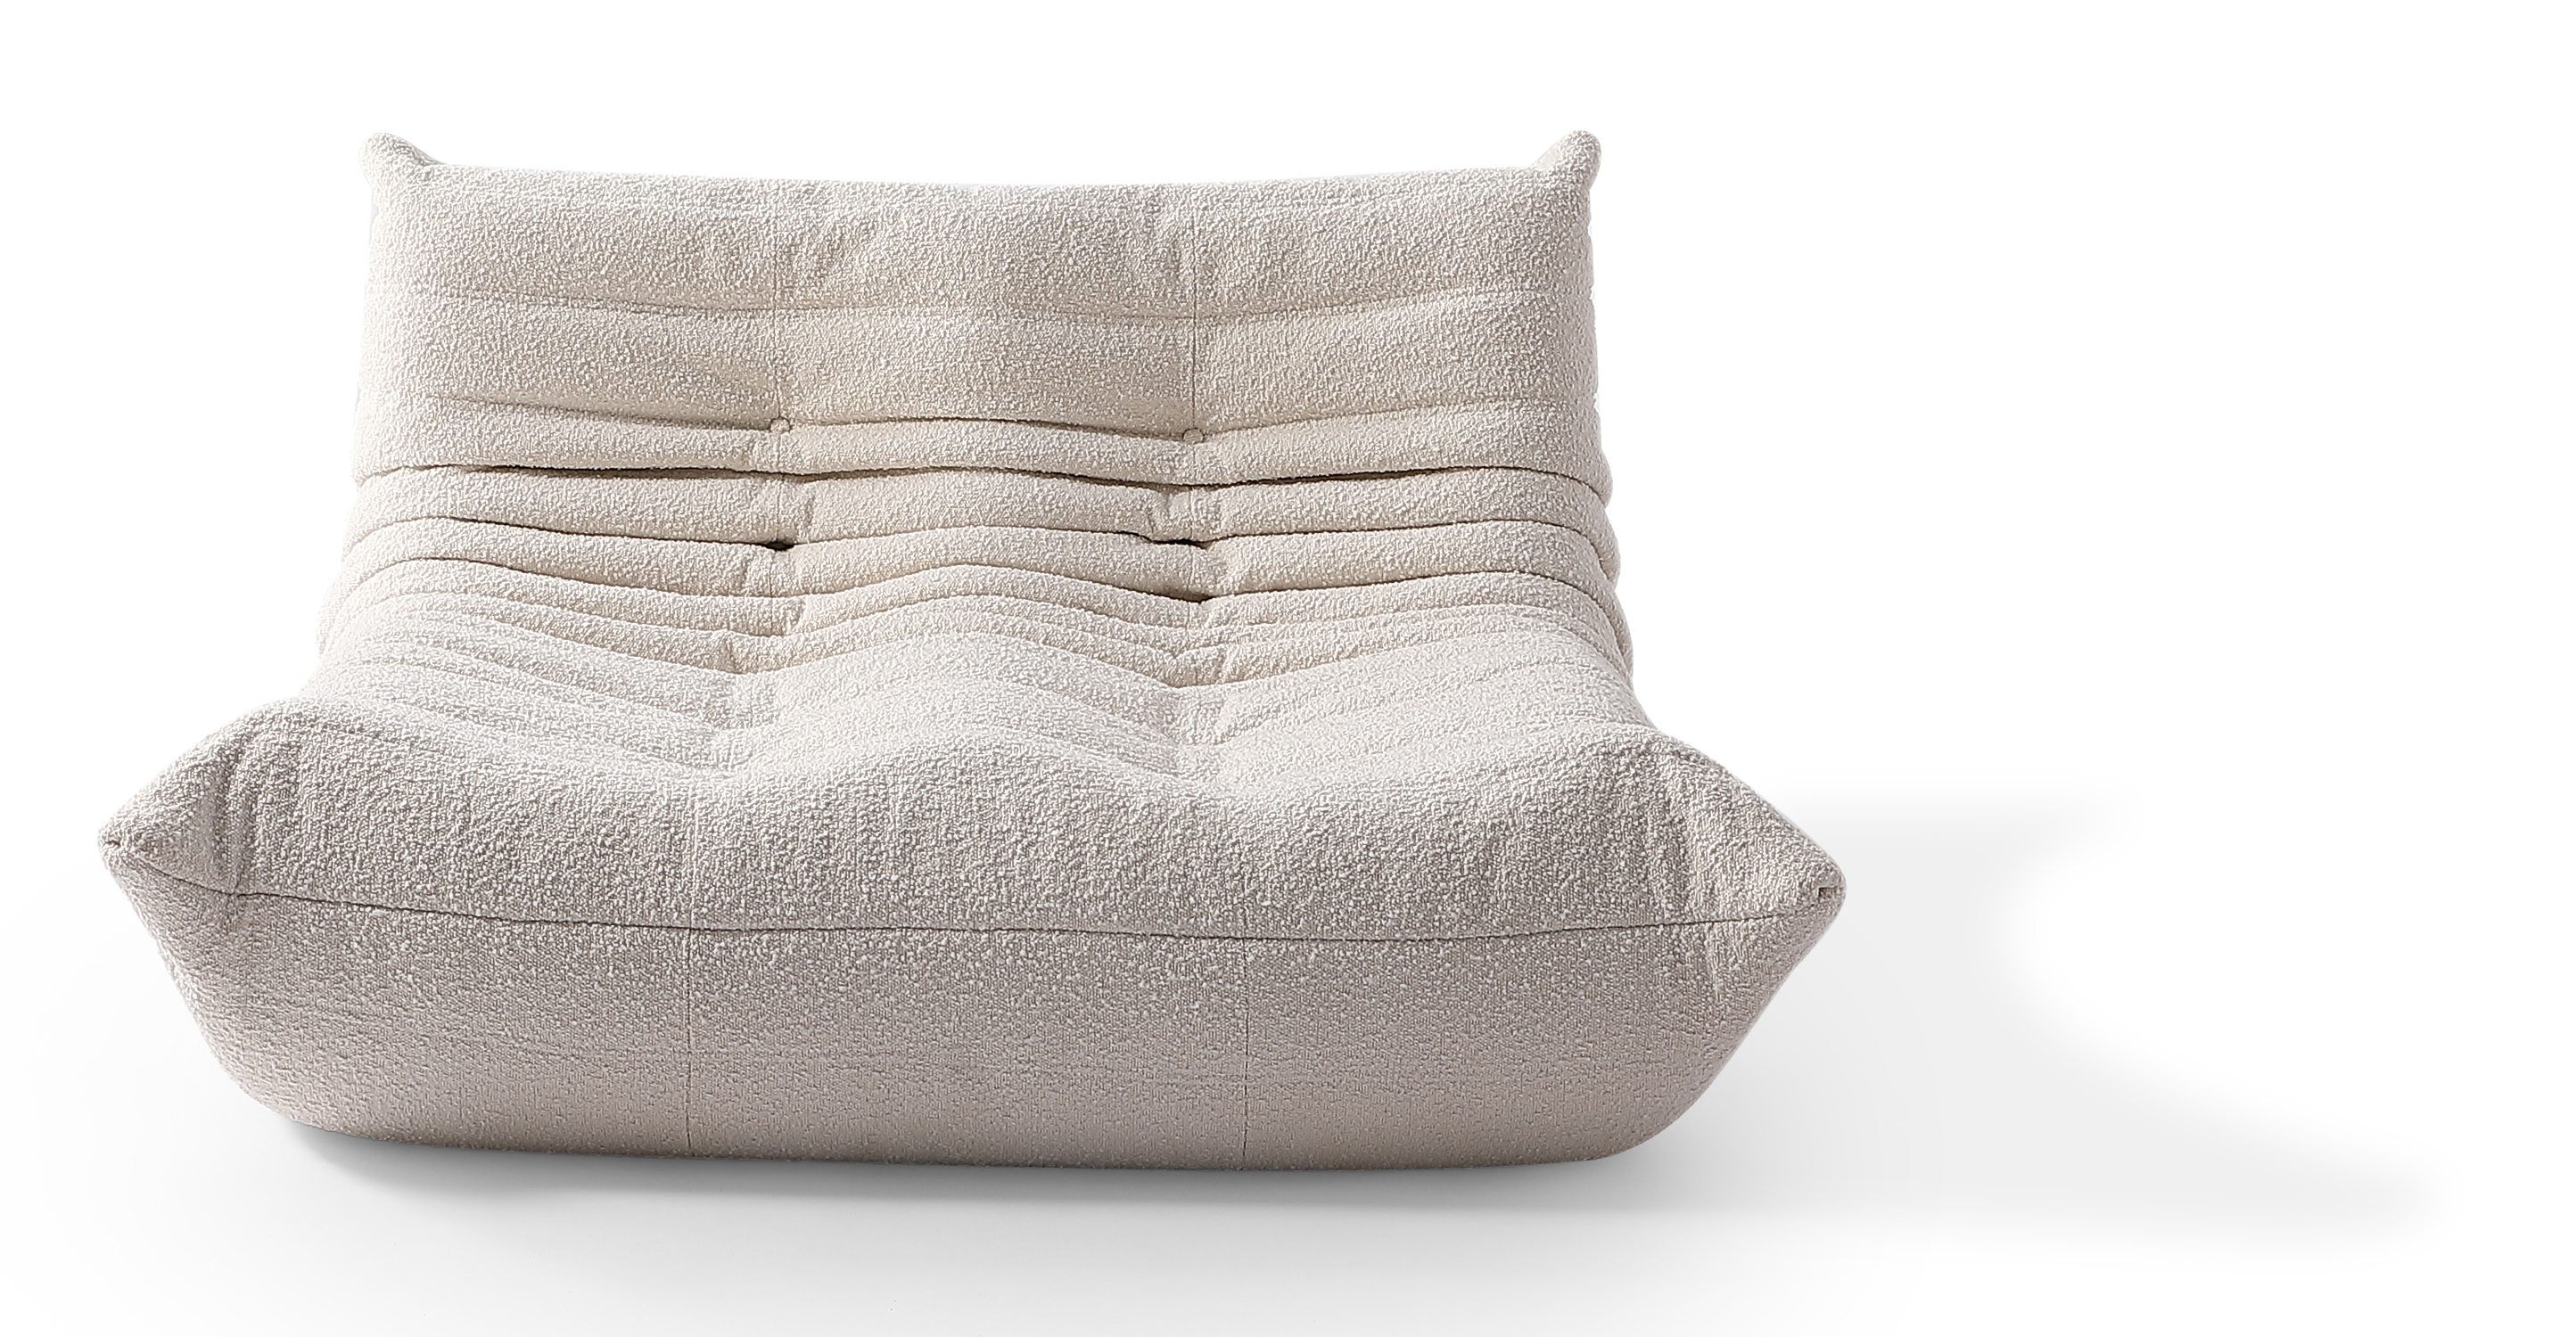 "Louvre 53"" Fabric 2-Seat Lounge Sofa, Blanc Boucle"